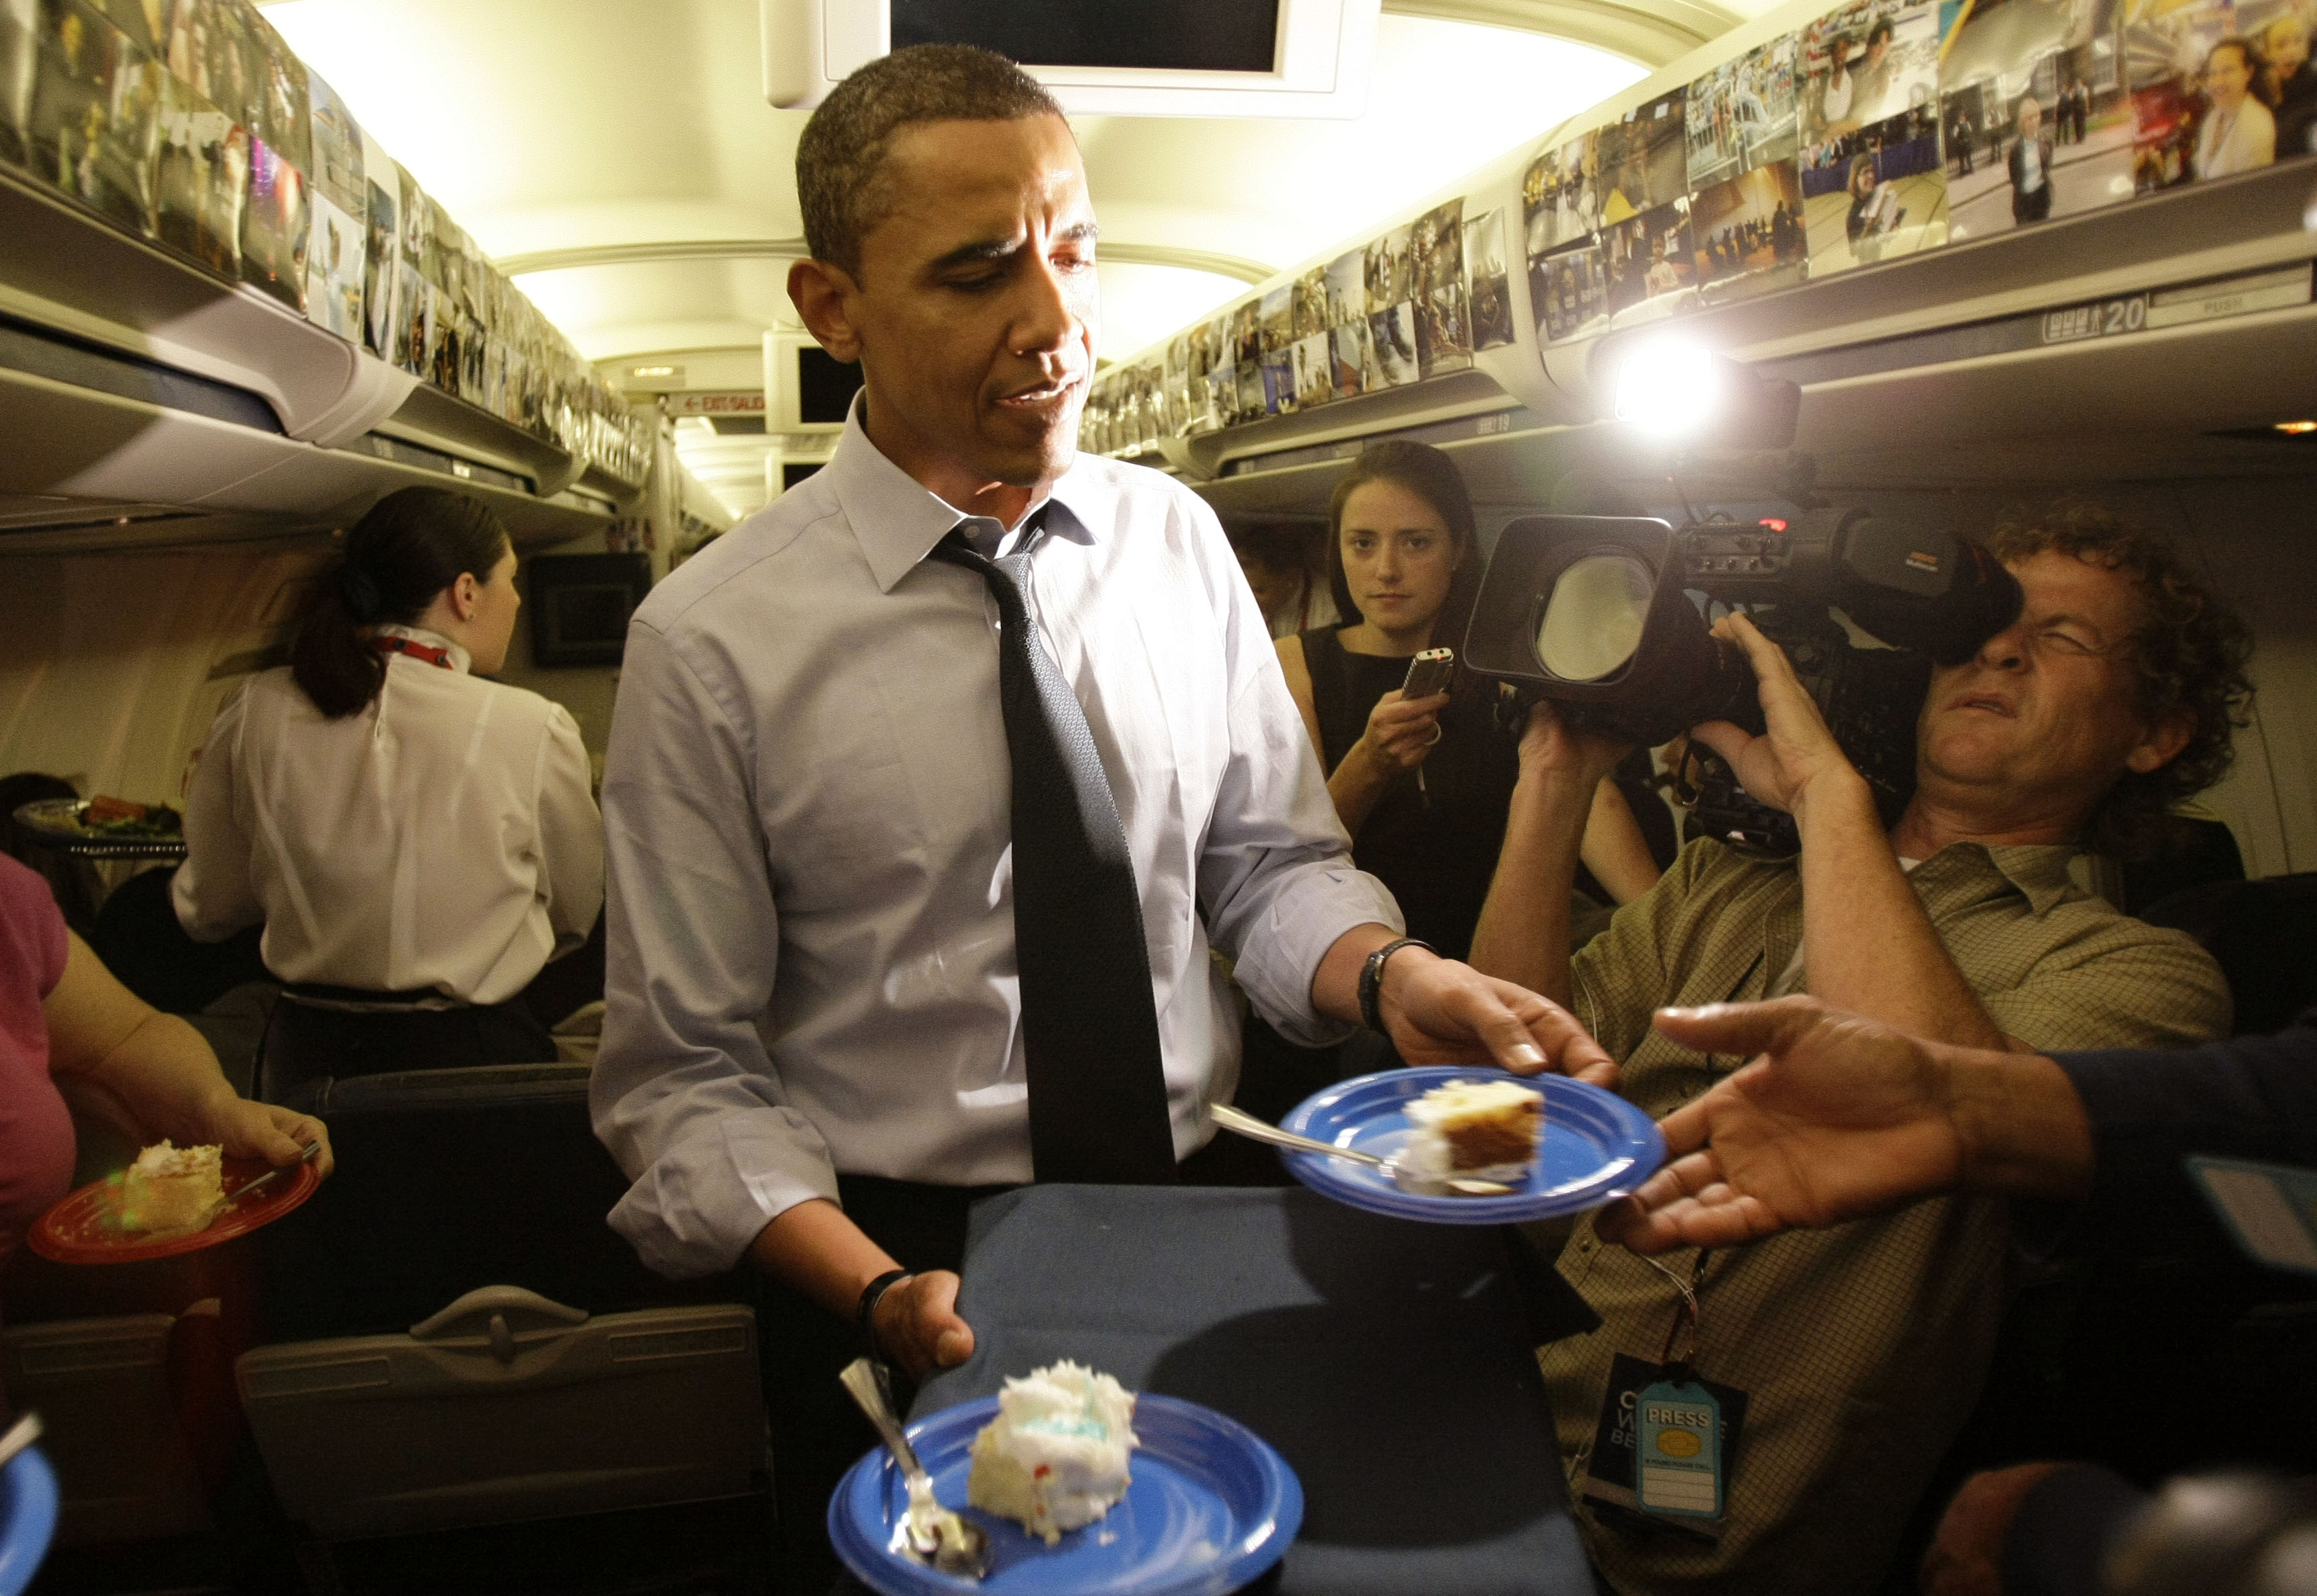 Astonishing A Not So Modest Obama Birthday Wish The Spokesman Review Funny Birthday Cards Online Inifodamsfinfo